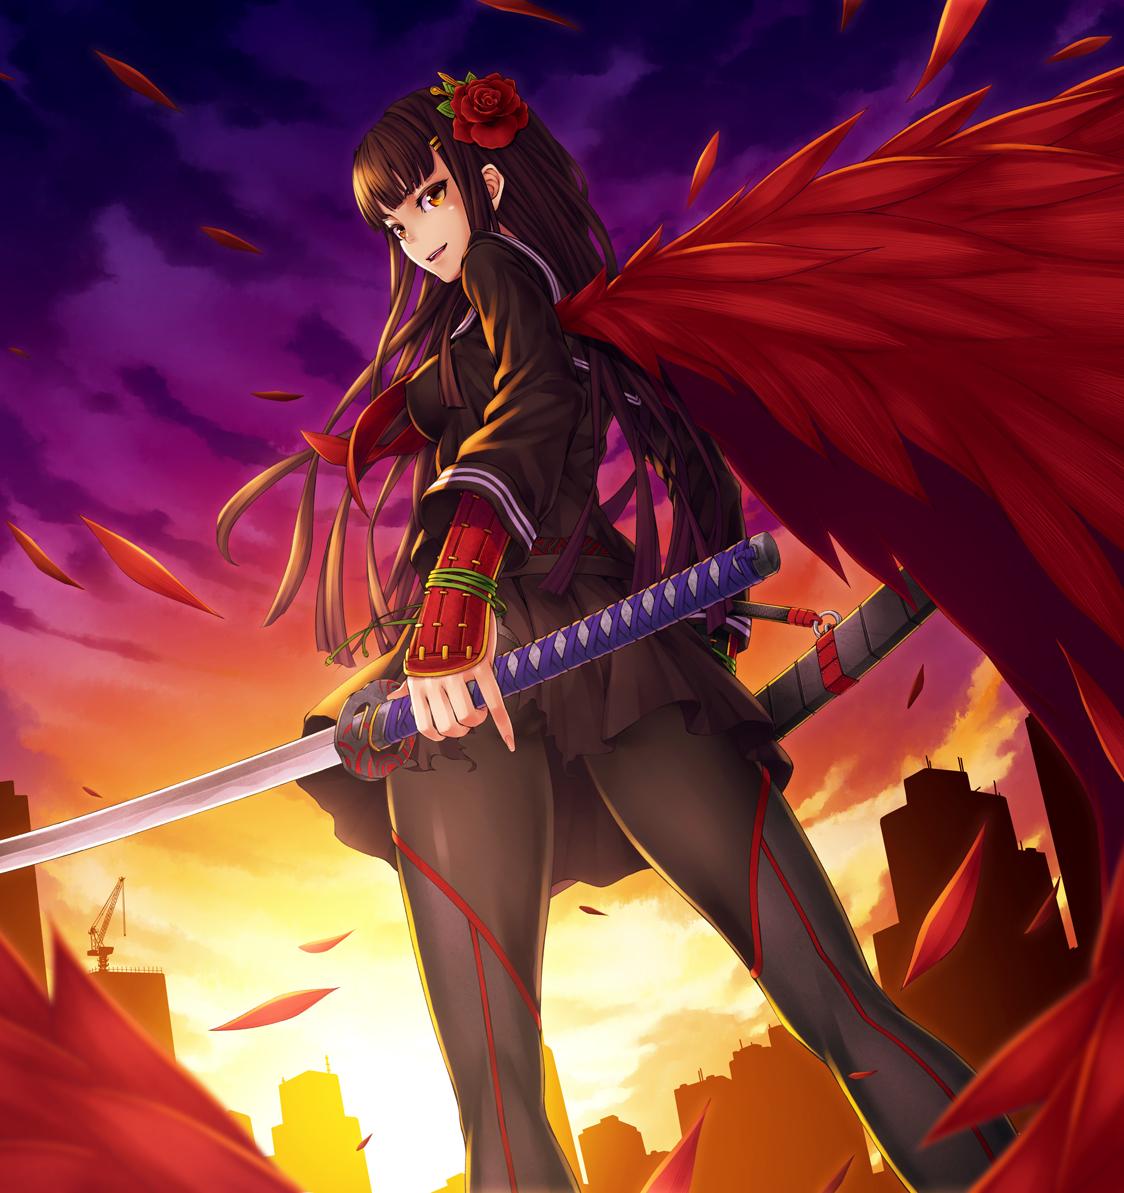 Картинки аниме девушка демон с мечом